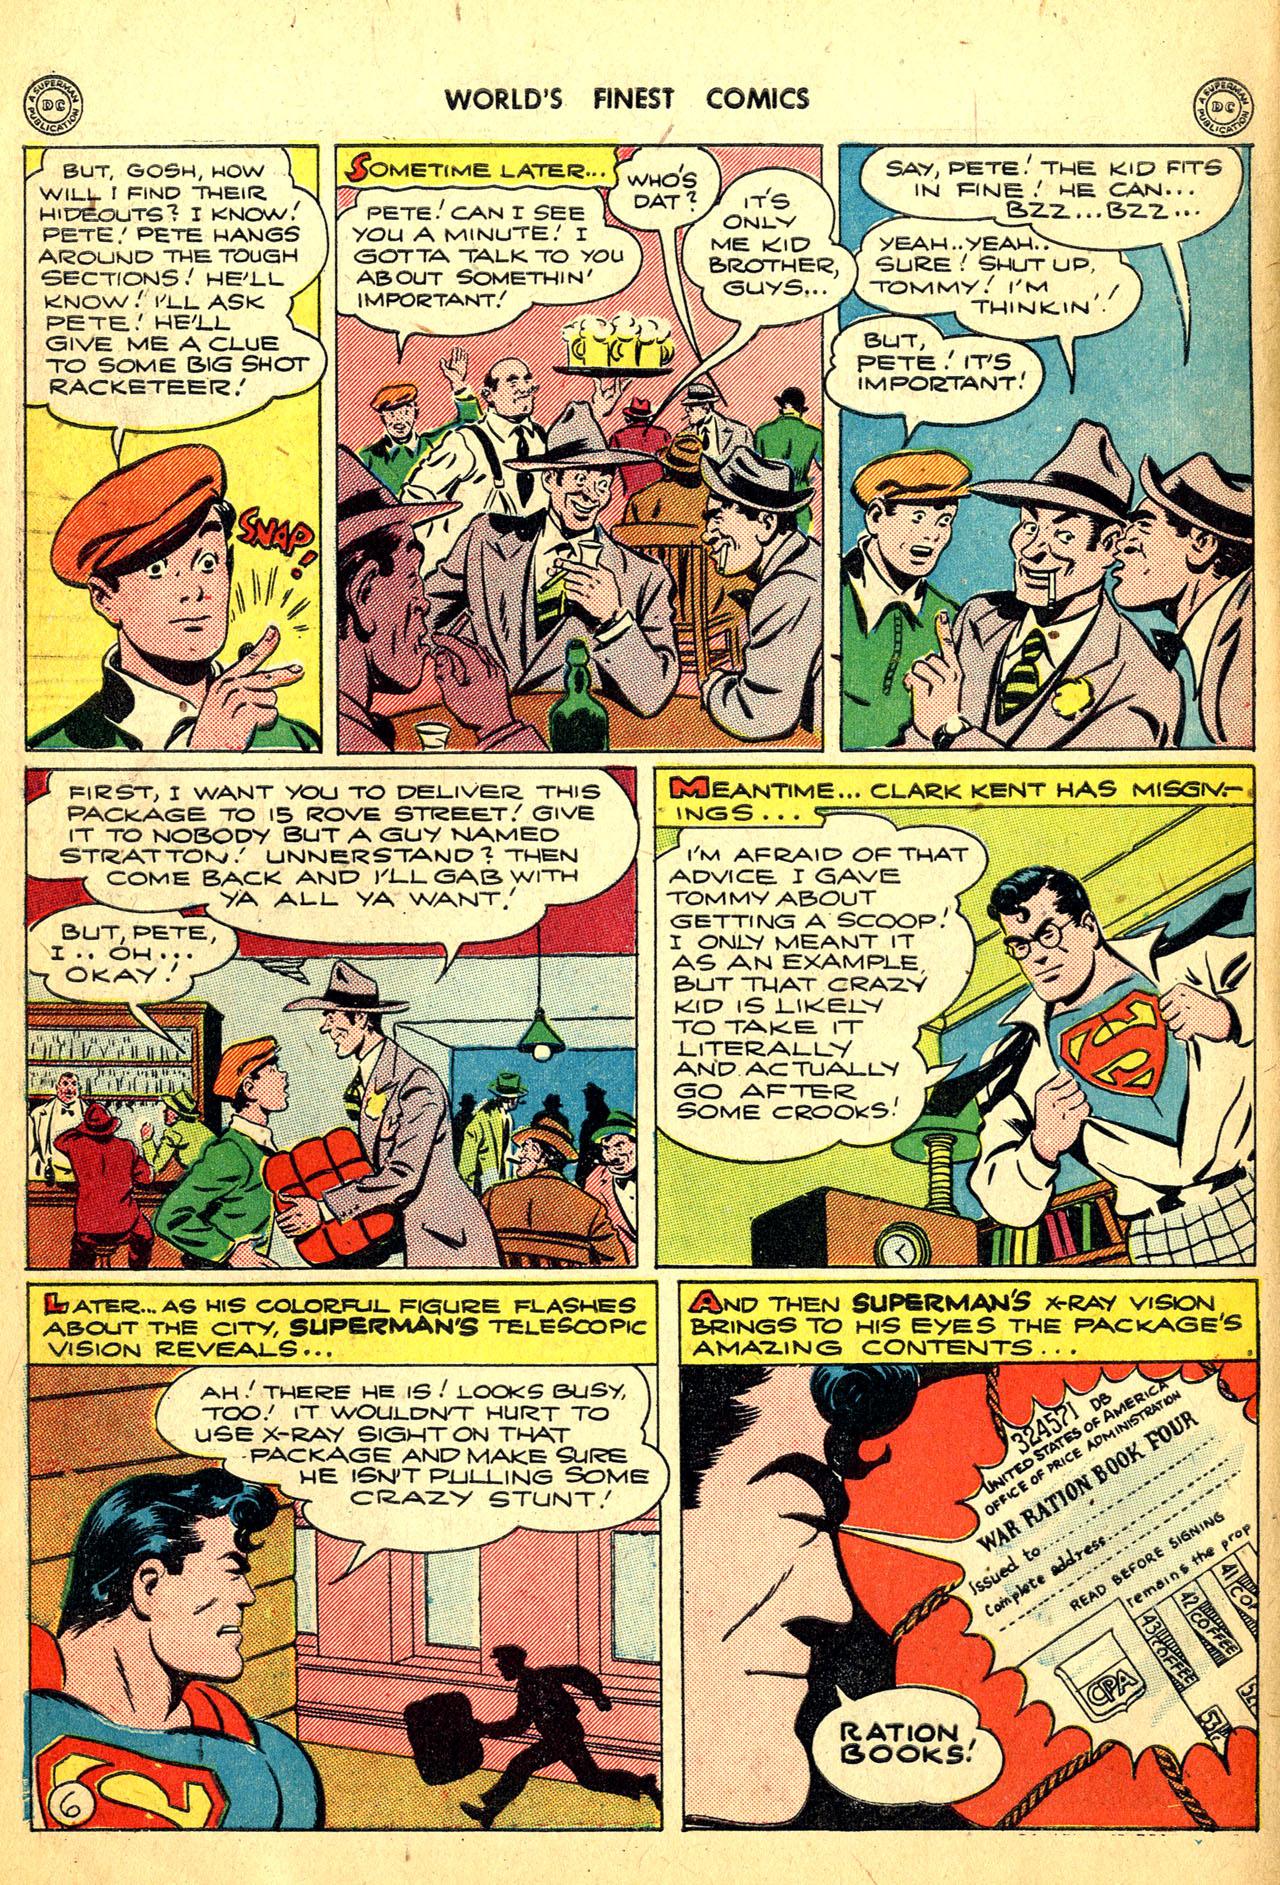 Read online World's Finest Comics comic -  Issue #18 - 8